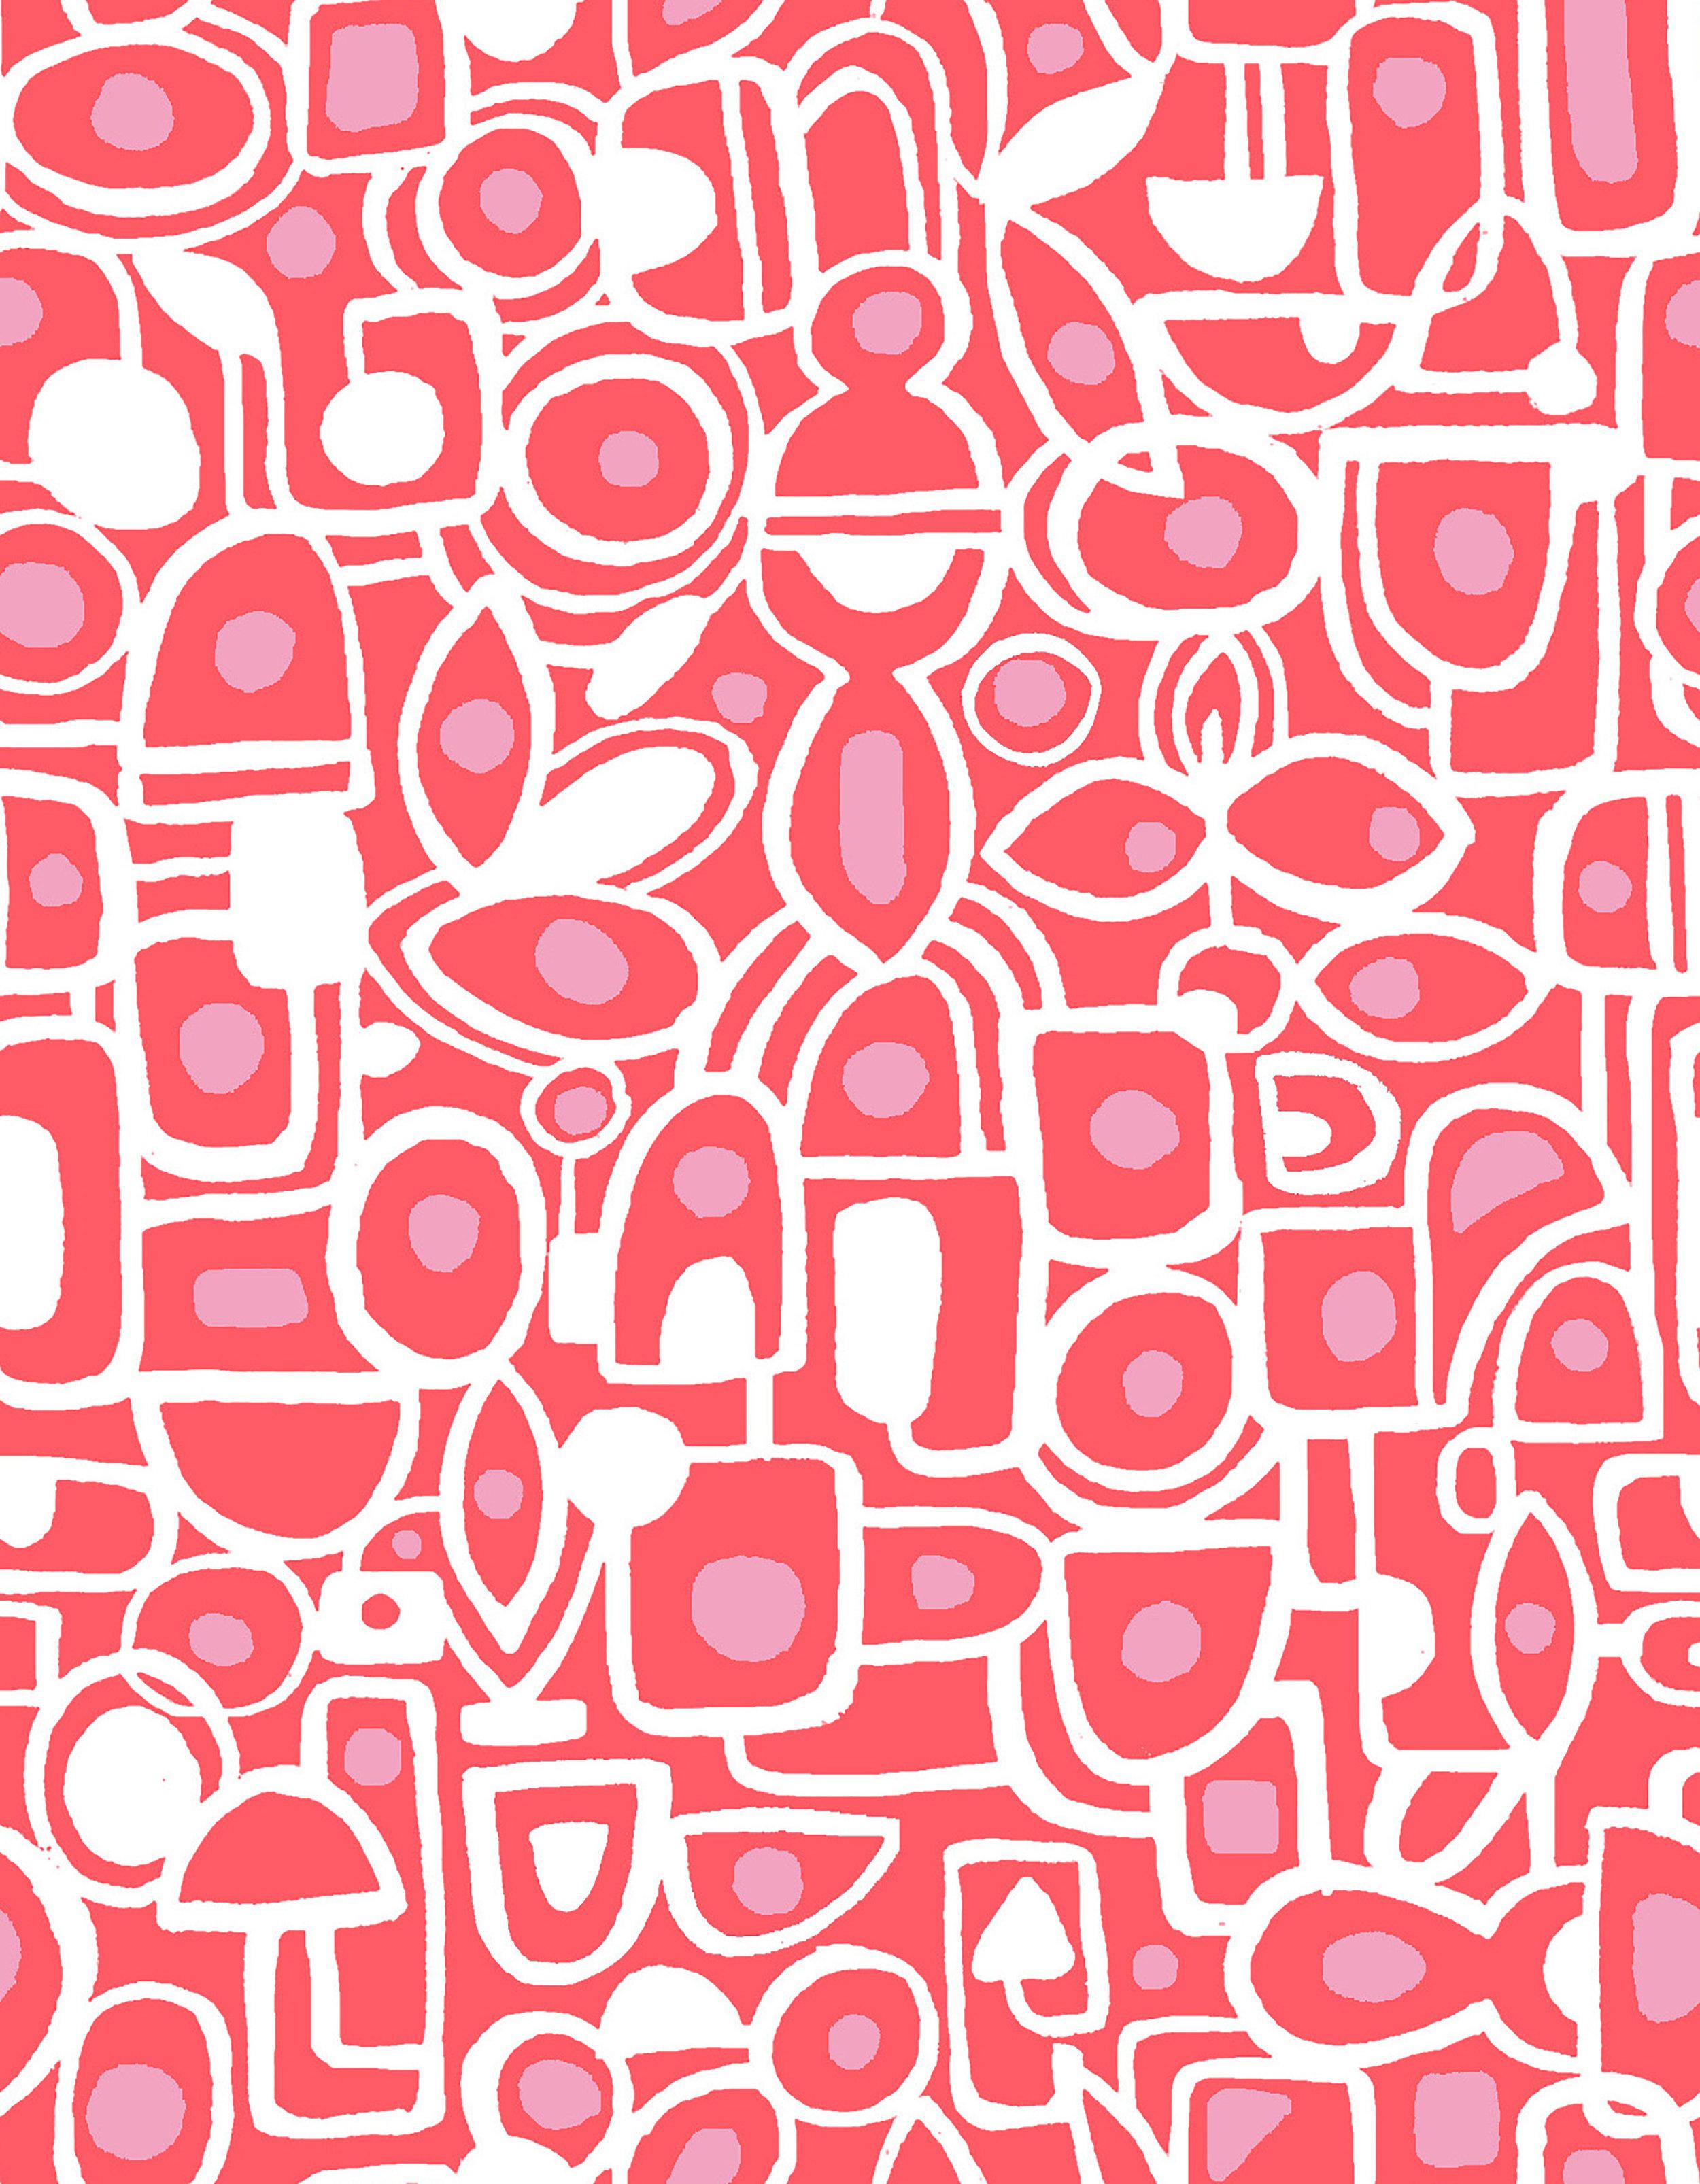 lines&dots_pinkred.jpg